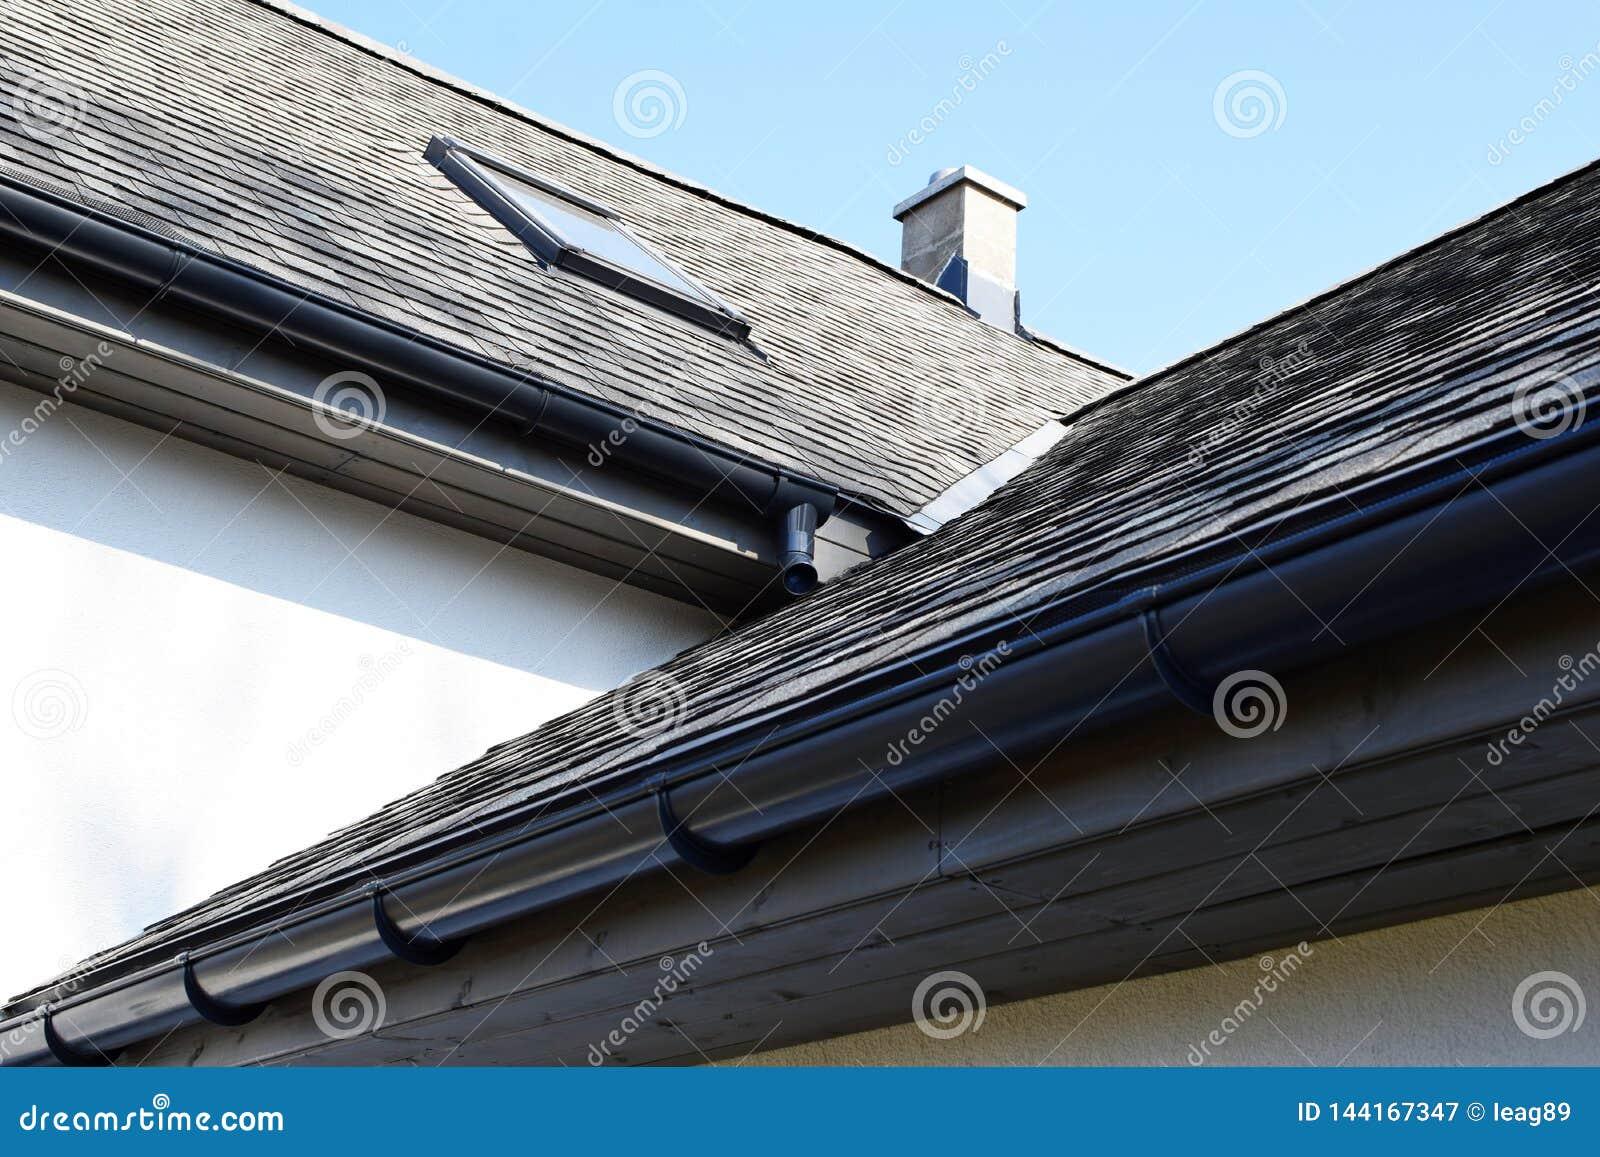 Grey Asphalt Shingles Roof Construction Stock Image - Image